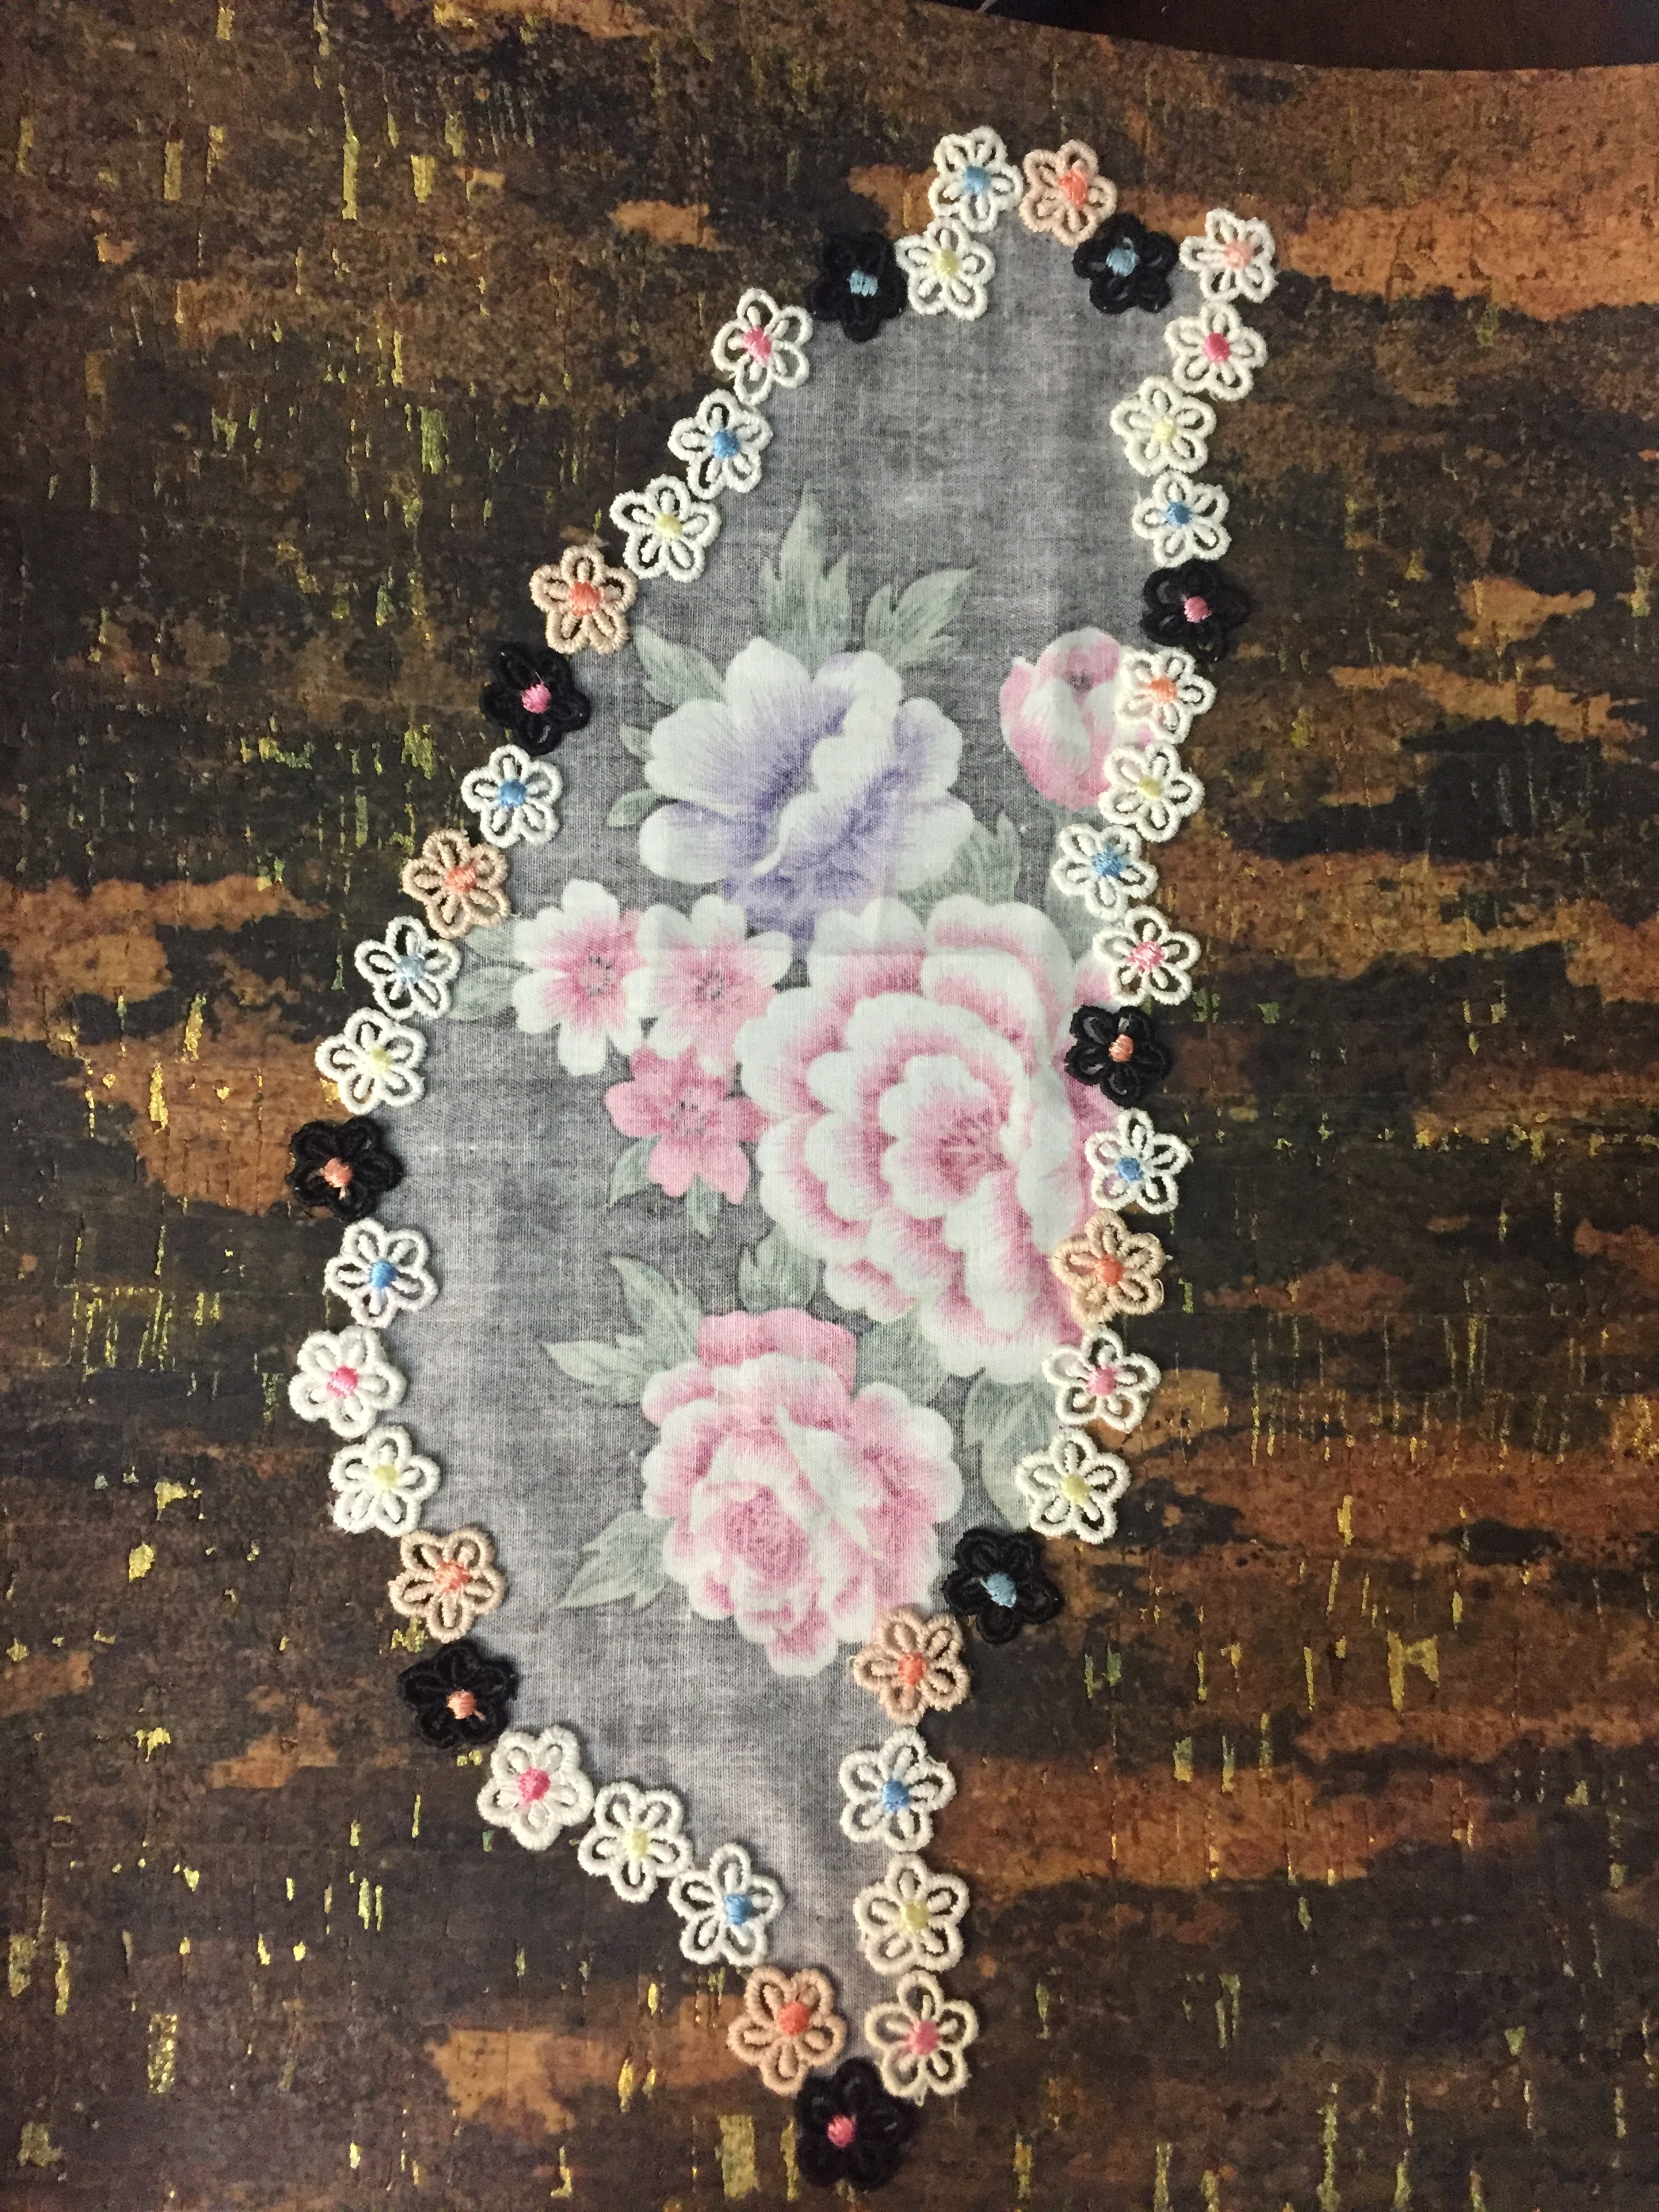 Taiwan Textile Art 1 - 2018. 13